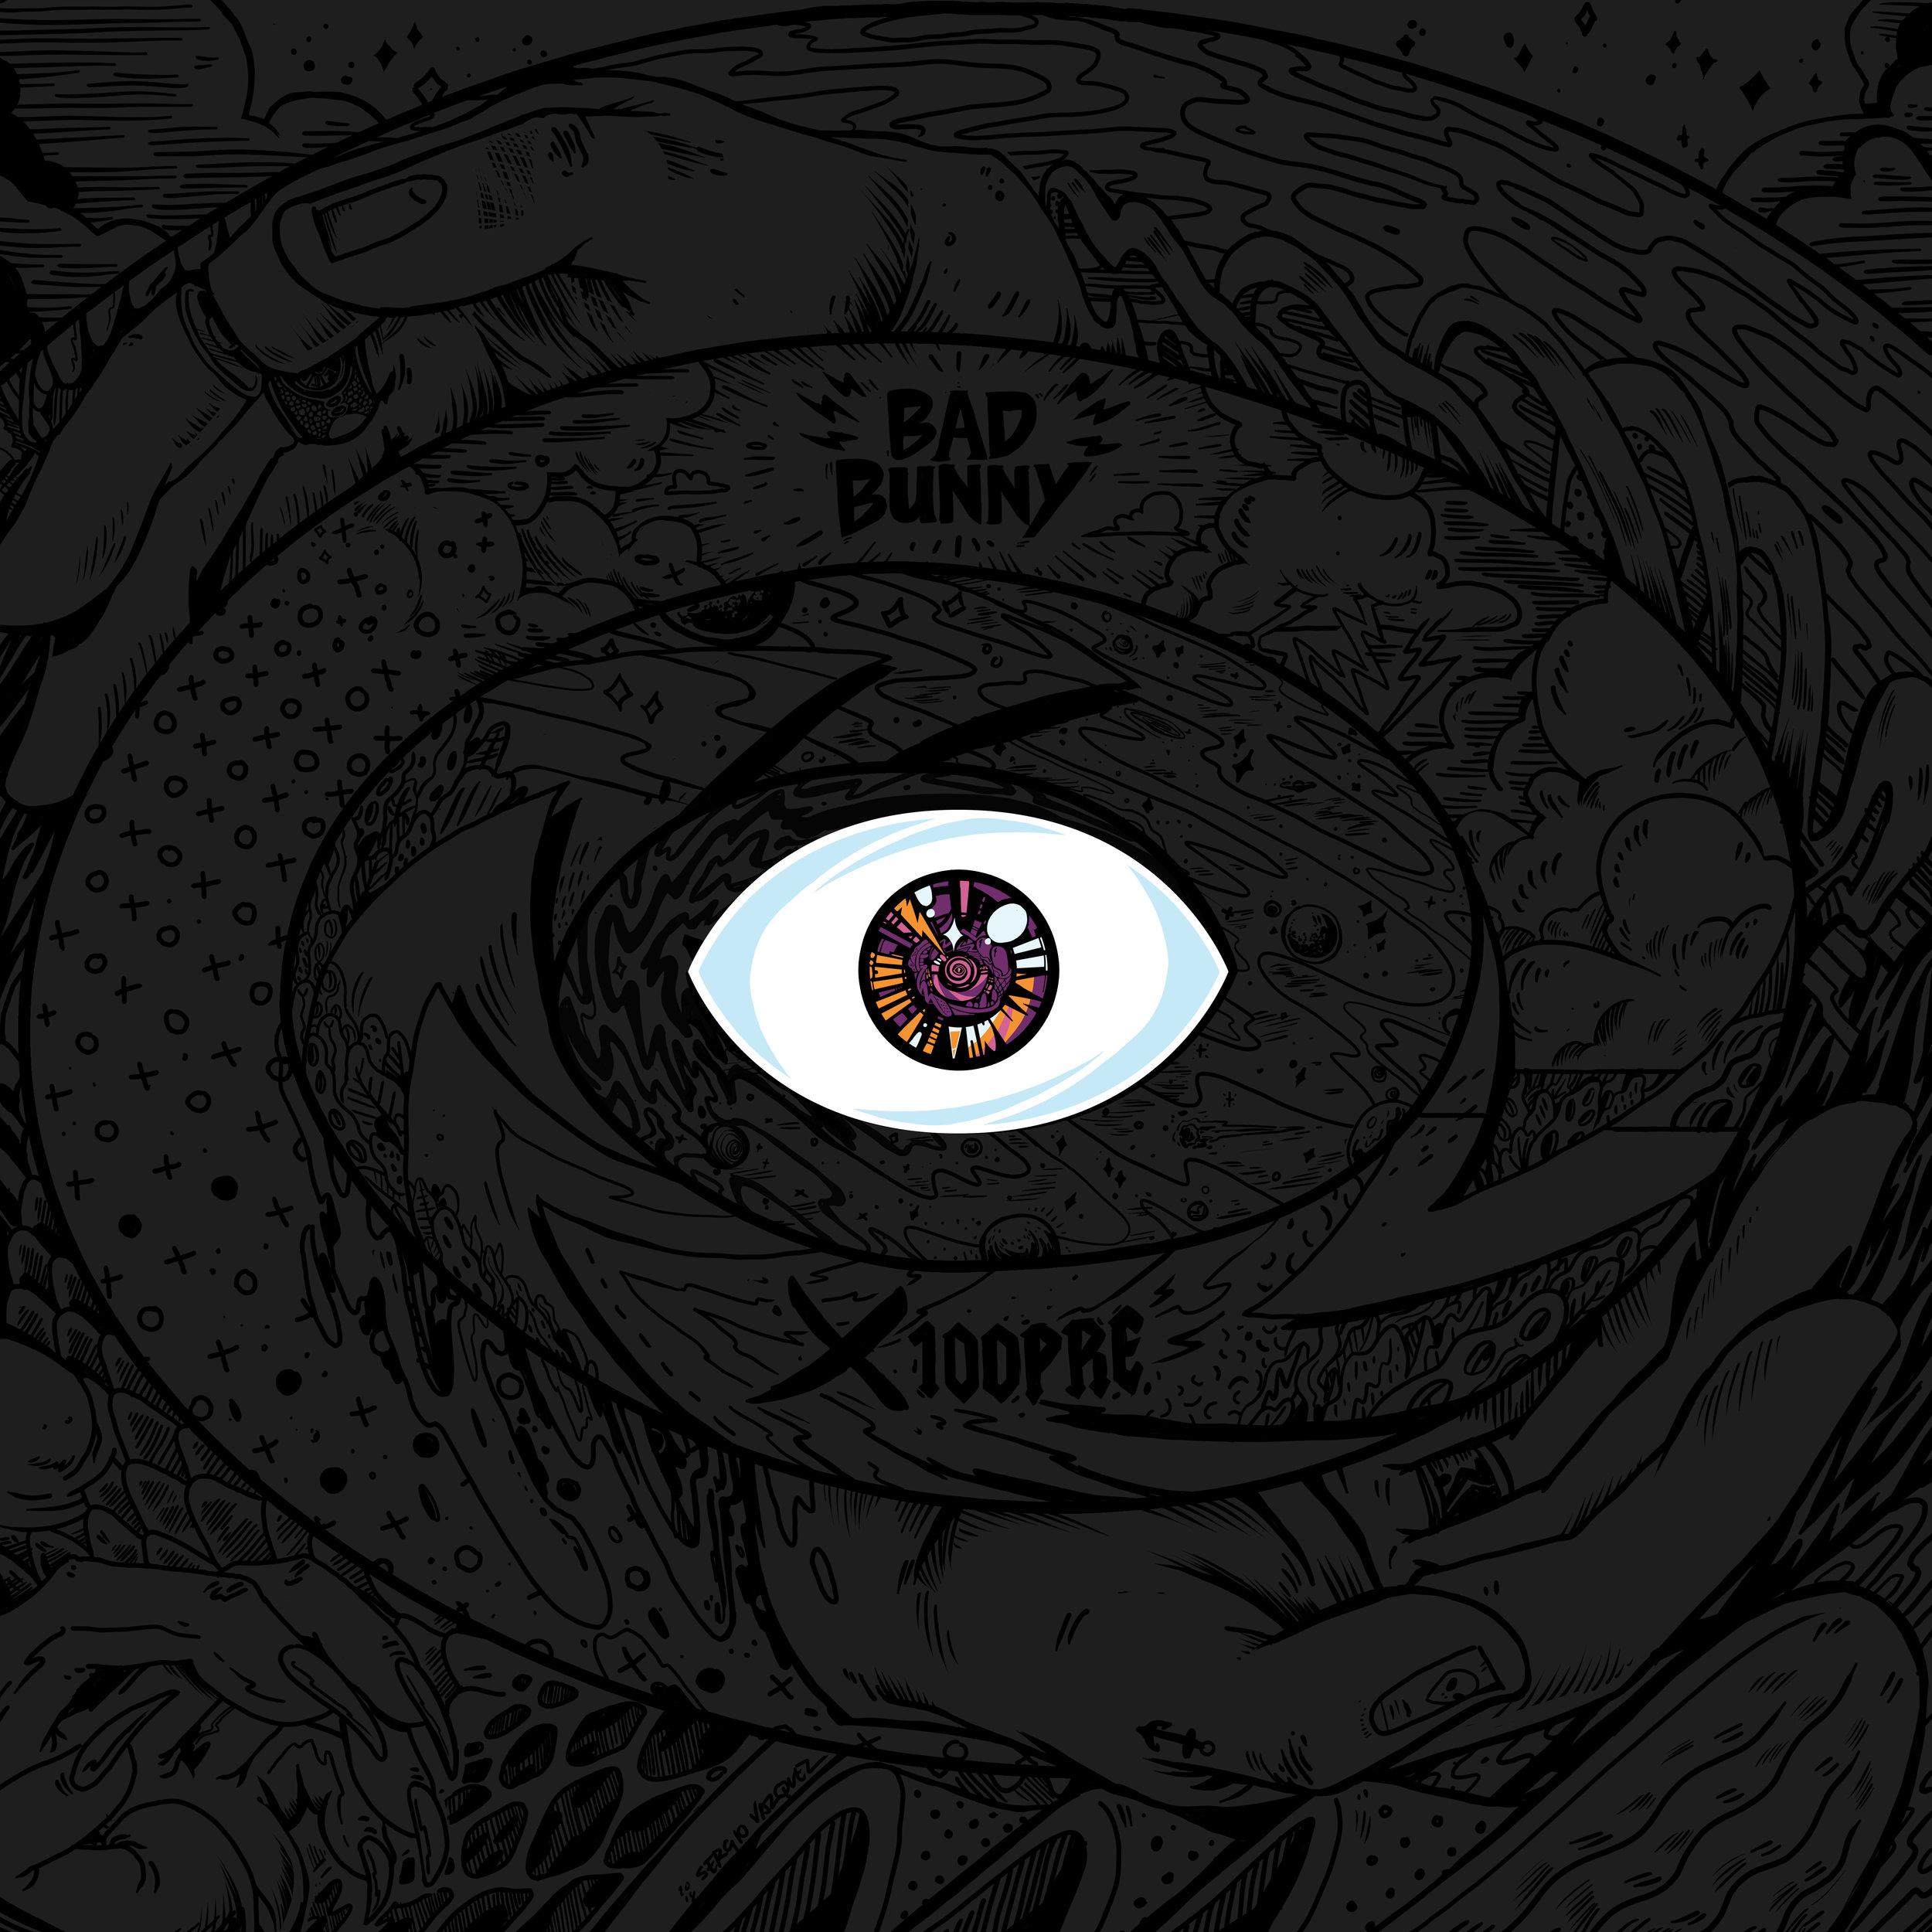 Arte disco Bad Bunny X 100PRE